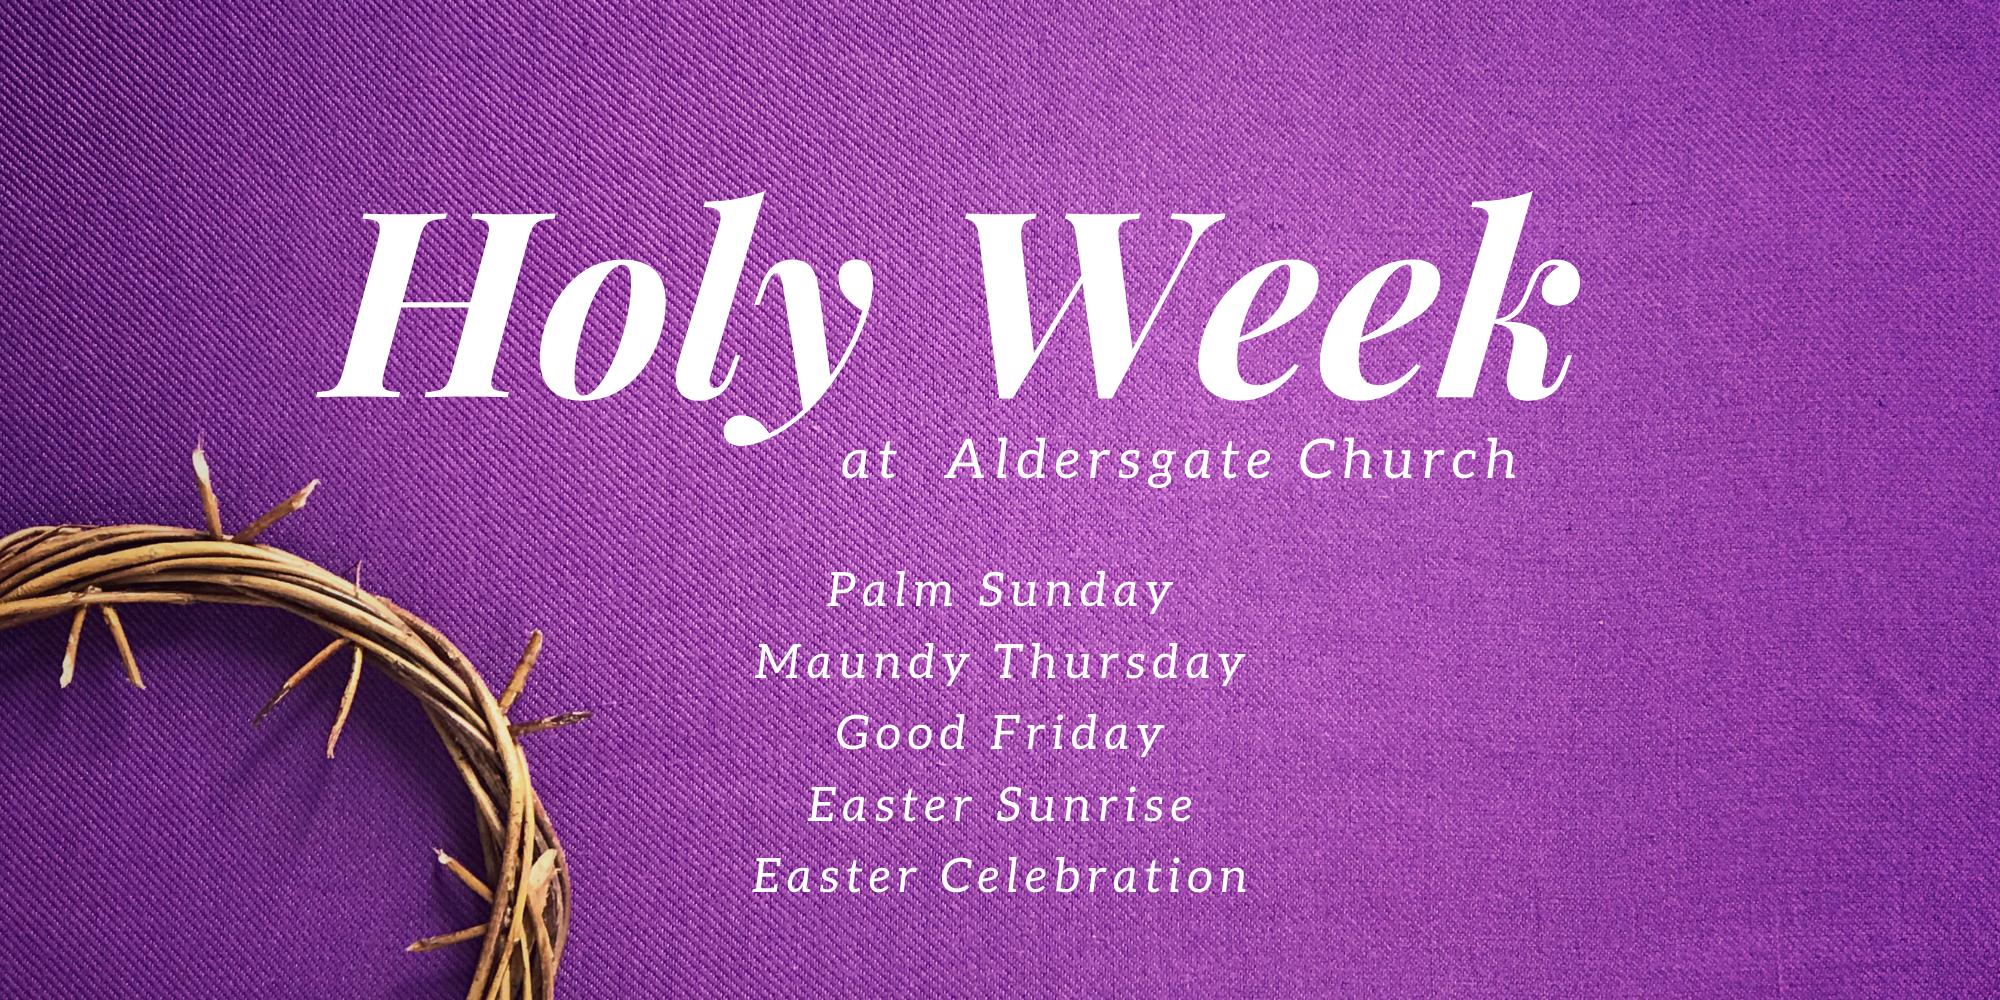 Holy Week at Aldersgate Church